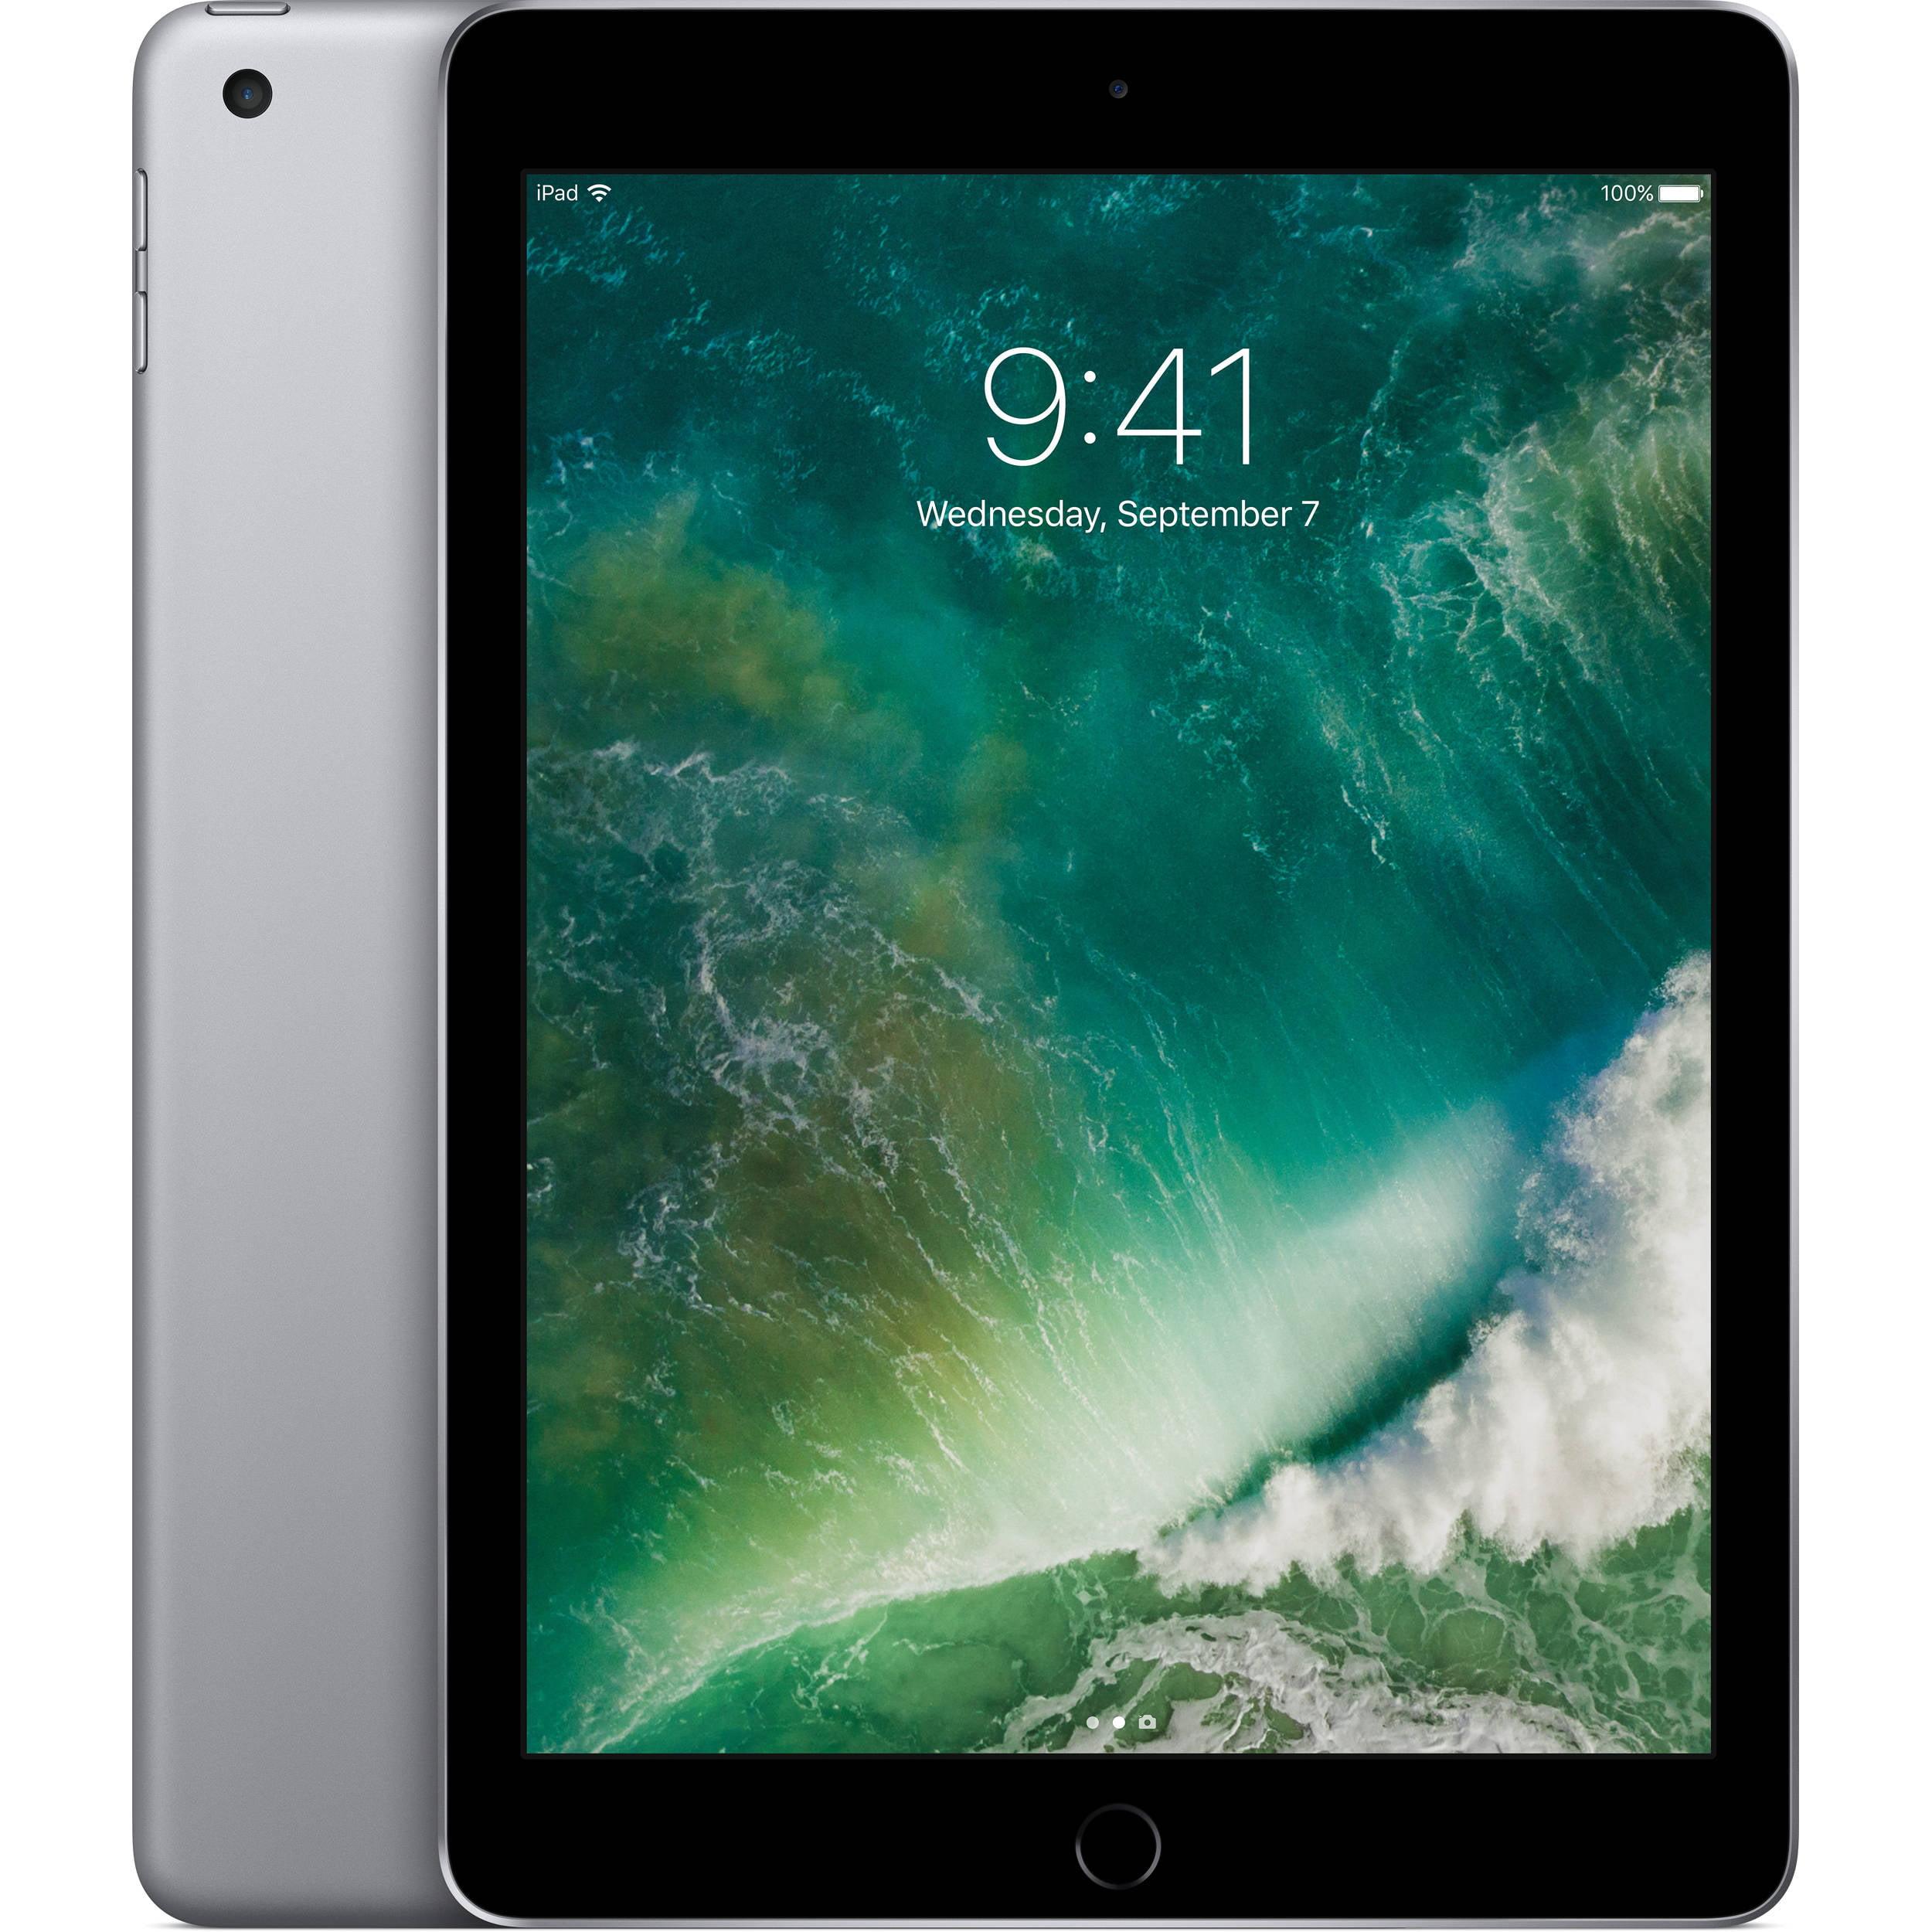 Certified Refurbished Apple iPad 2017 32GB Space Gray Wi-Fi MP2F2LL/A